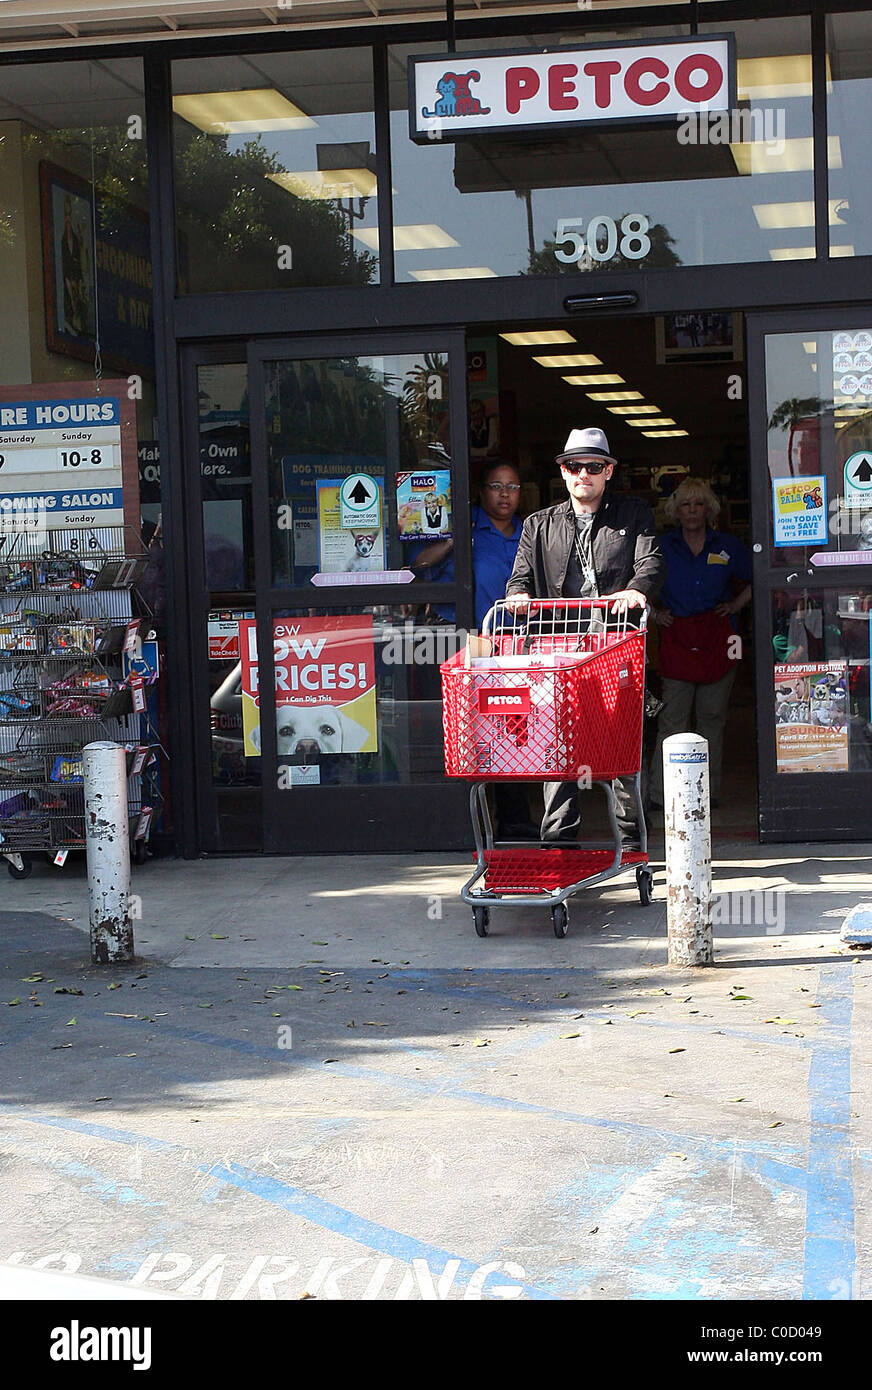 Paris Hilton and Benji Madden shopping for pet supplies at Petco